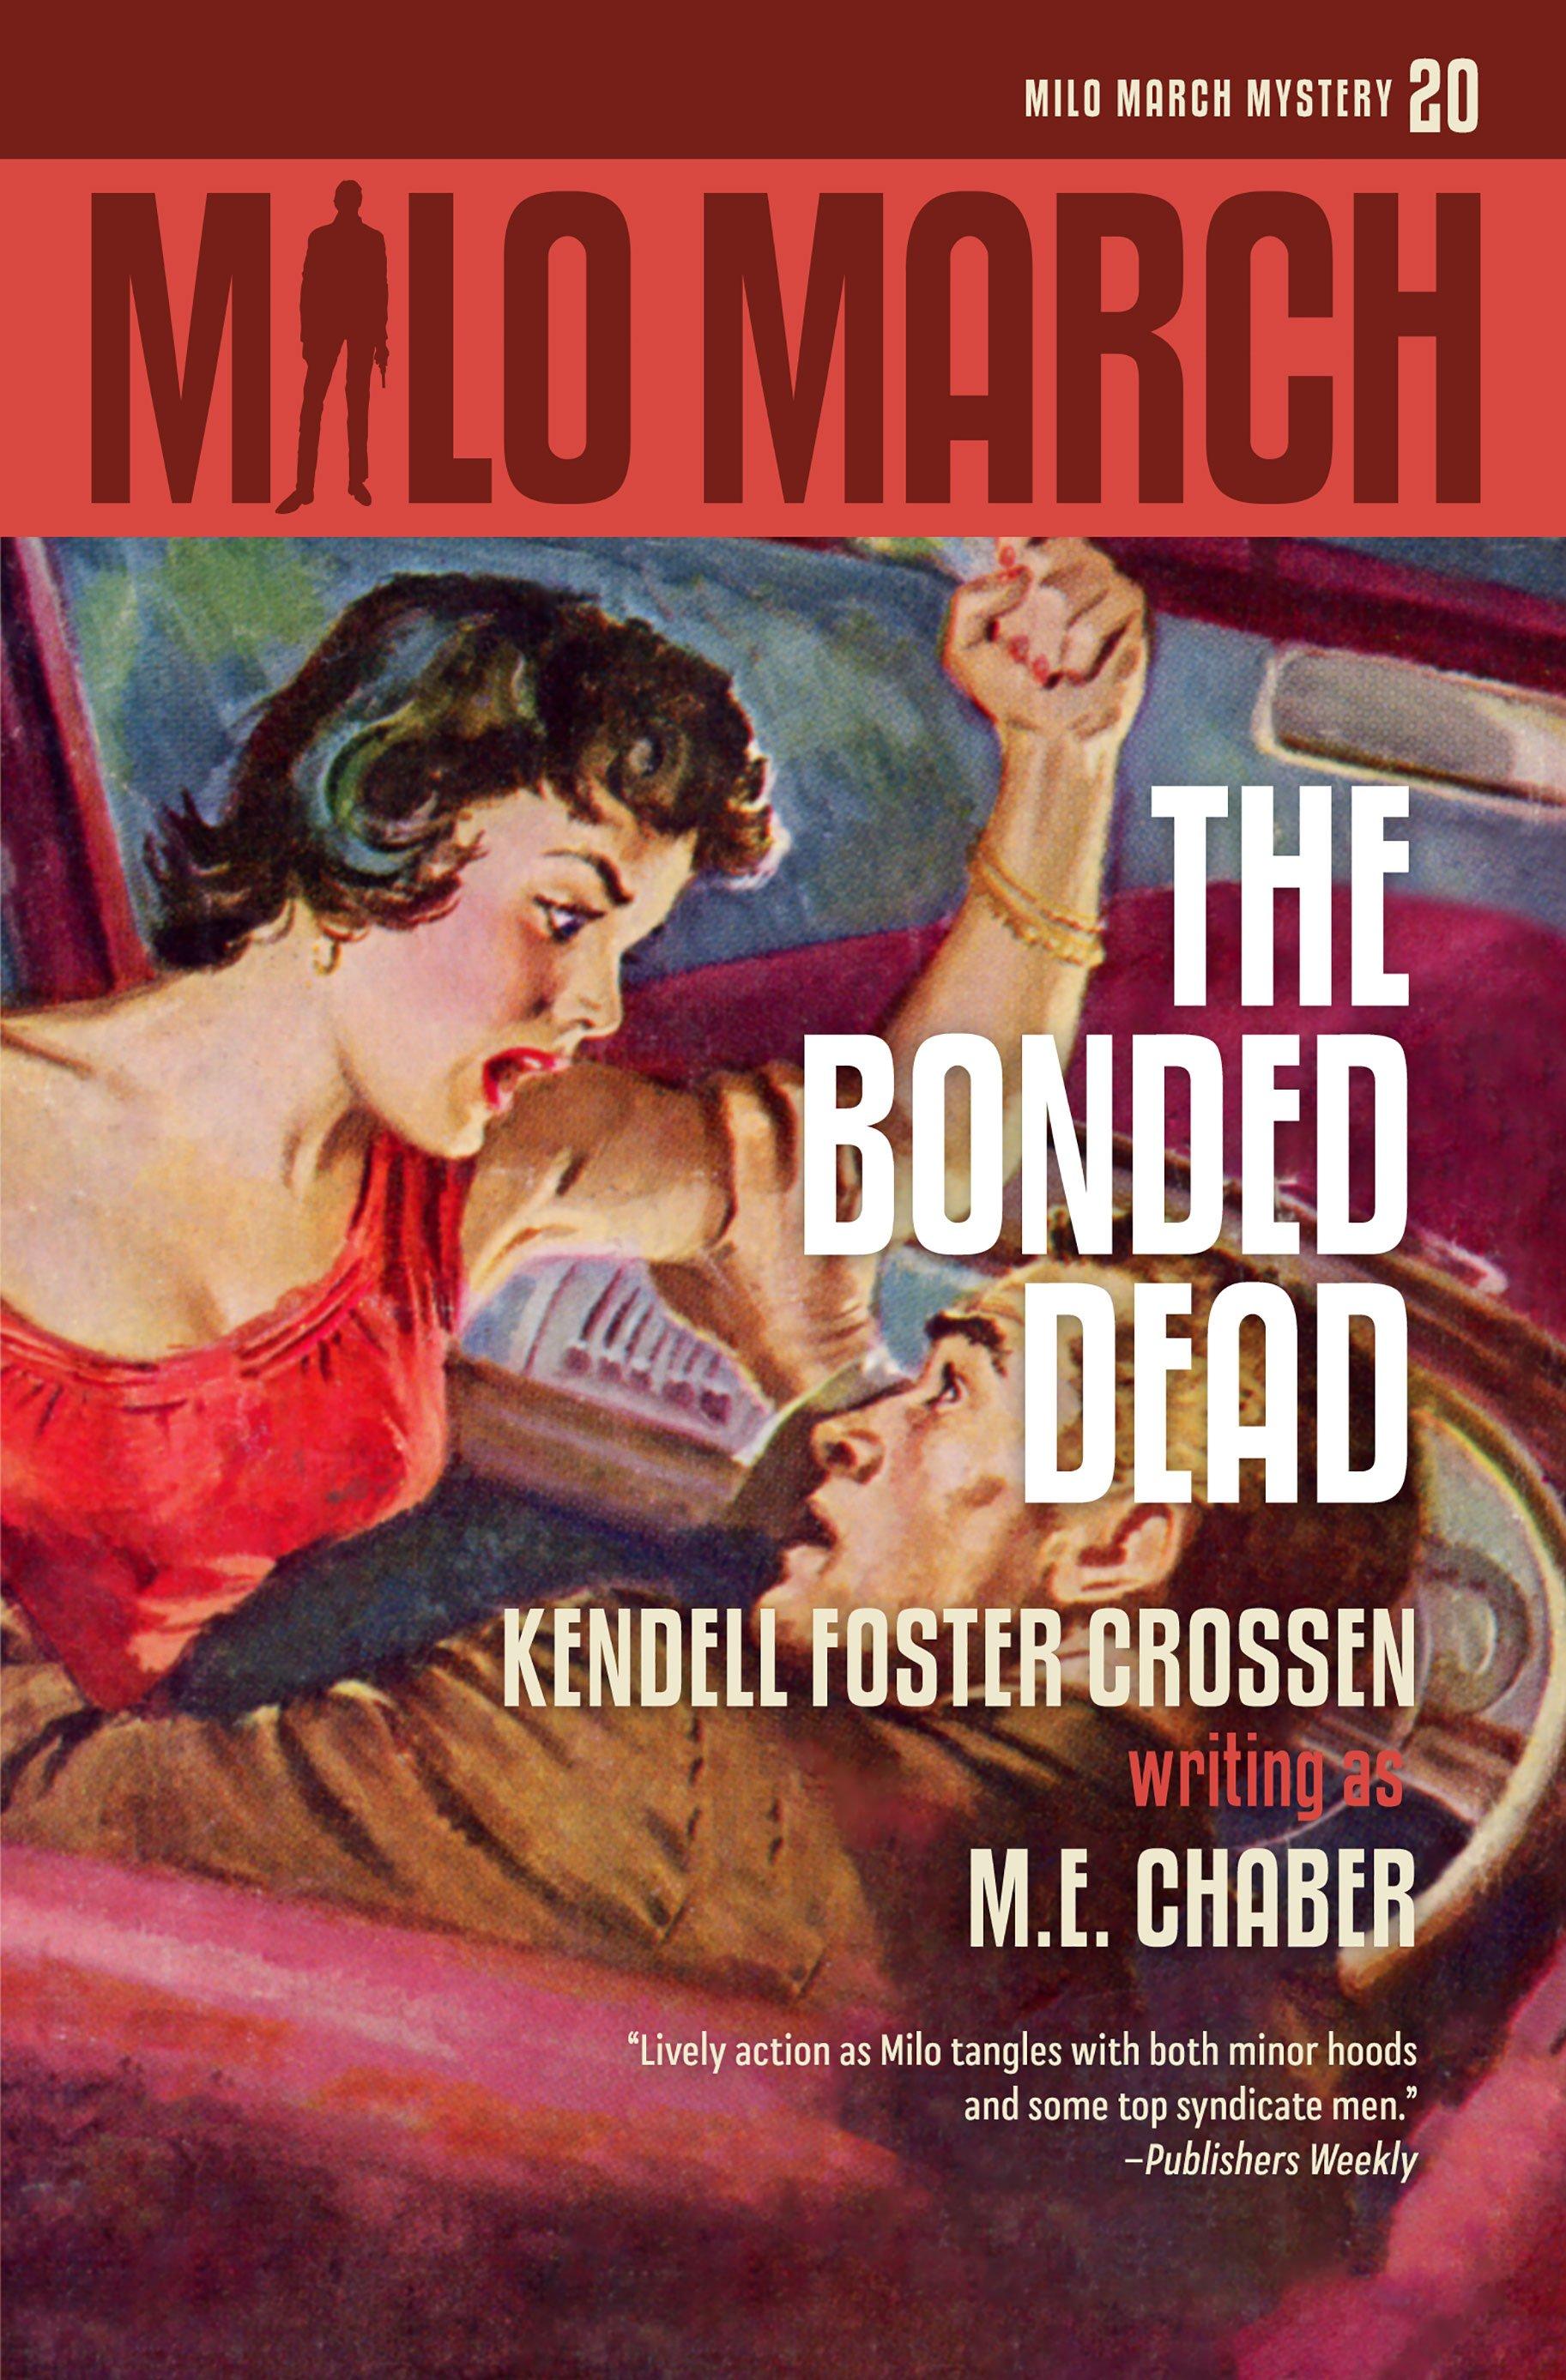 Milo March #20: The Bonded Dead